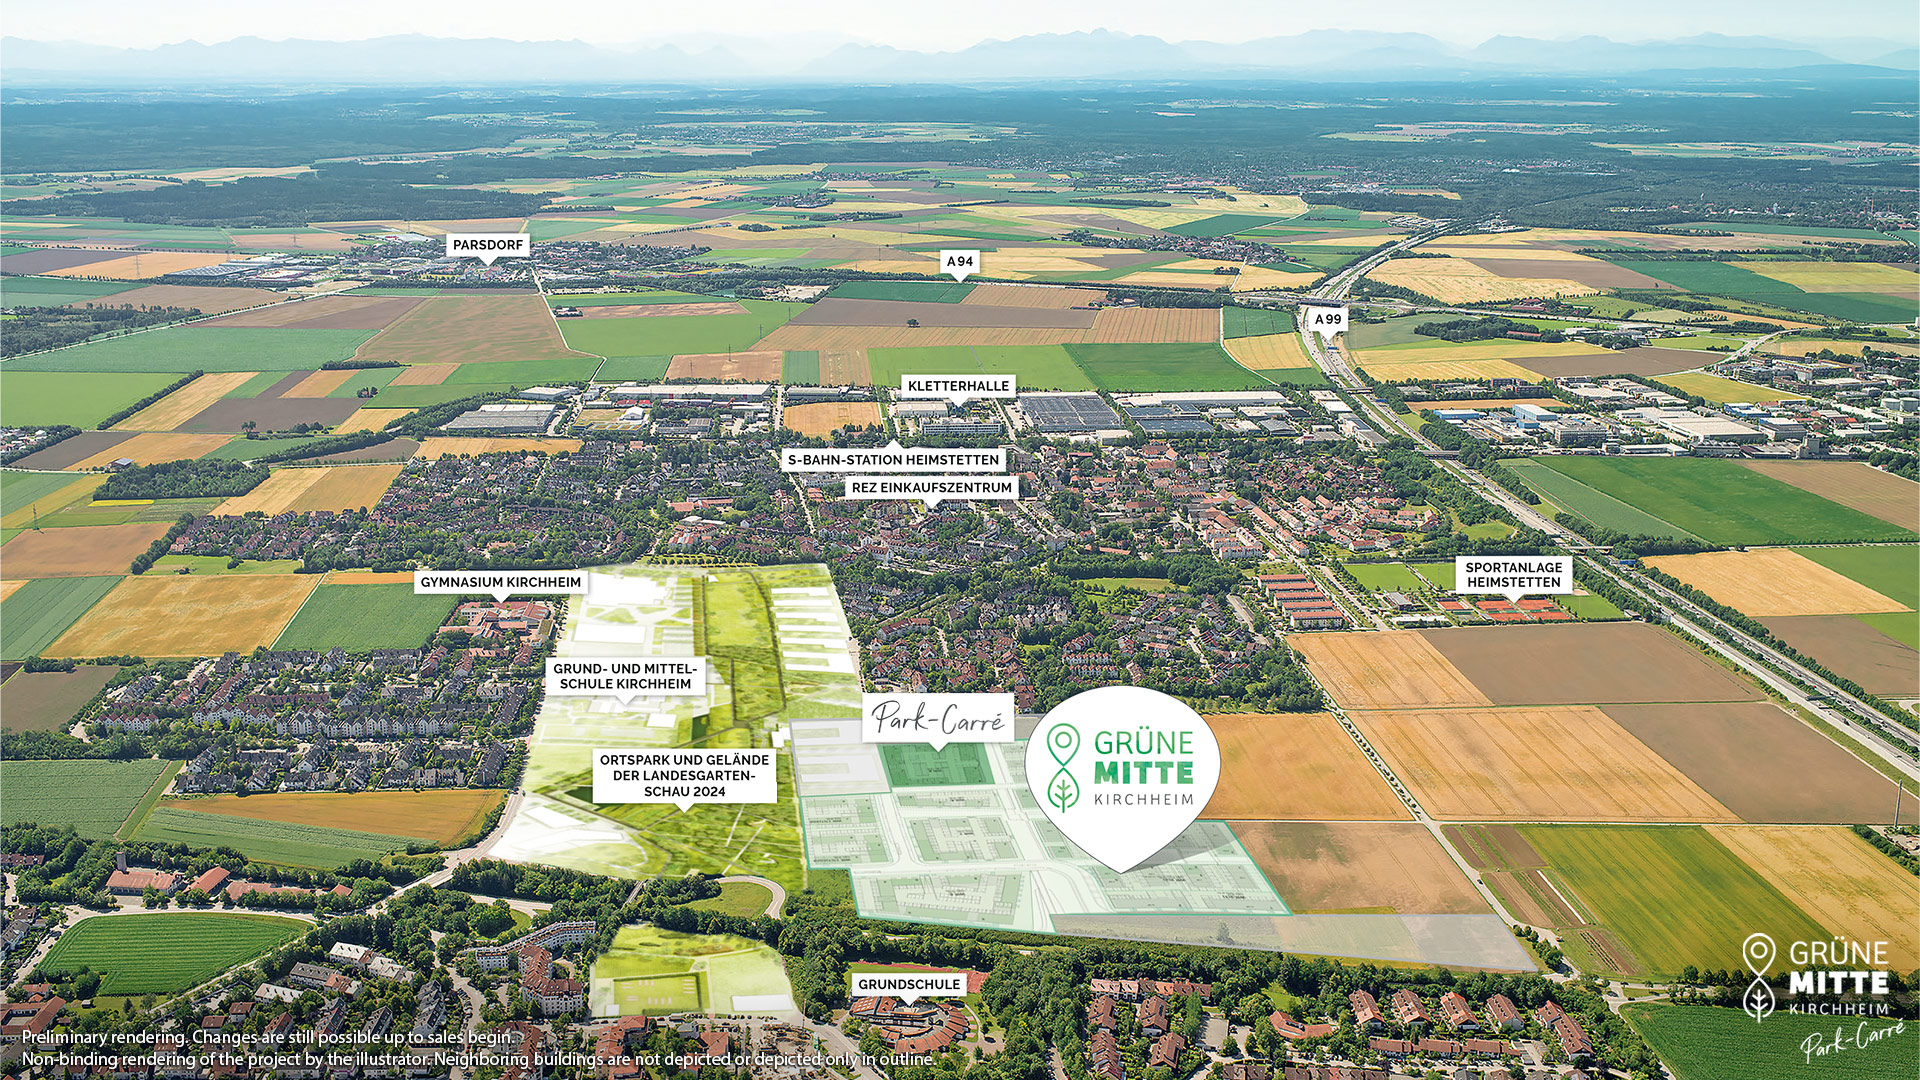 Property Gruene Mitte Kirchheim - park-Carr - Preannouncement - Aerial view